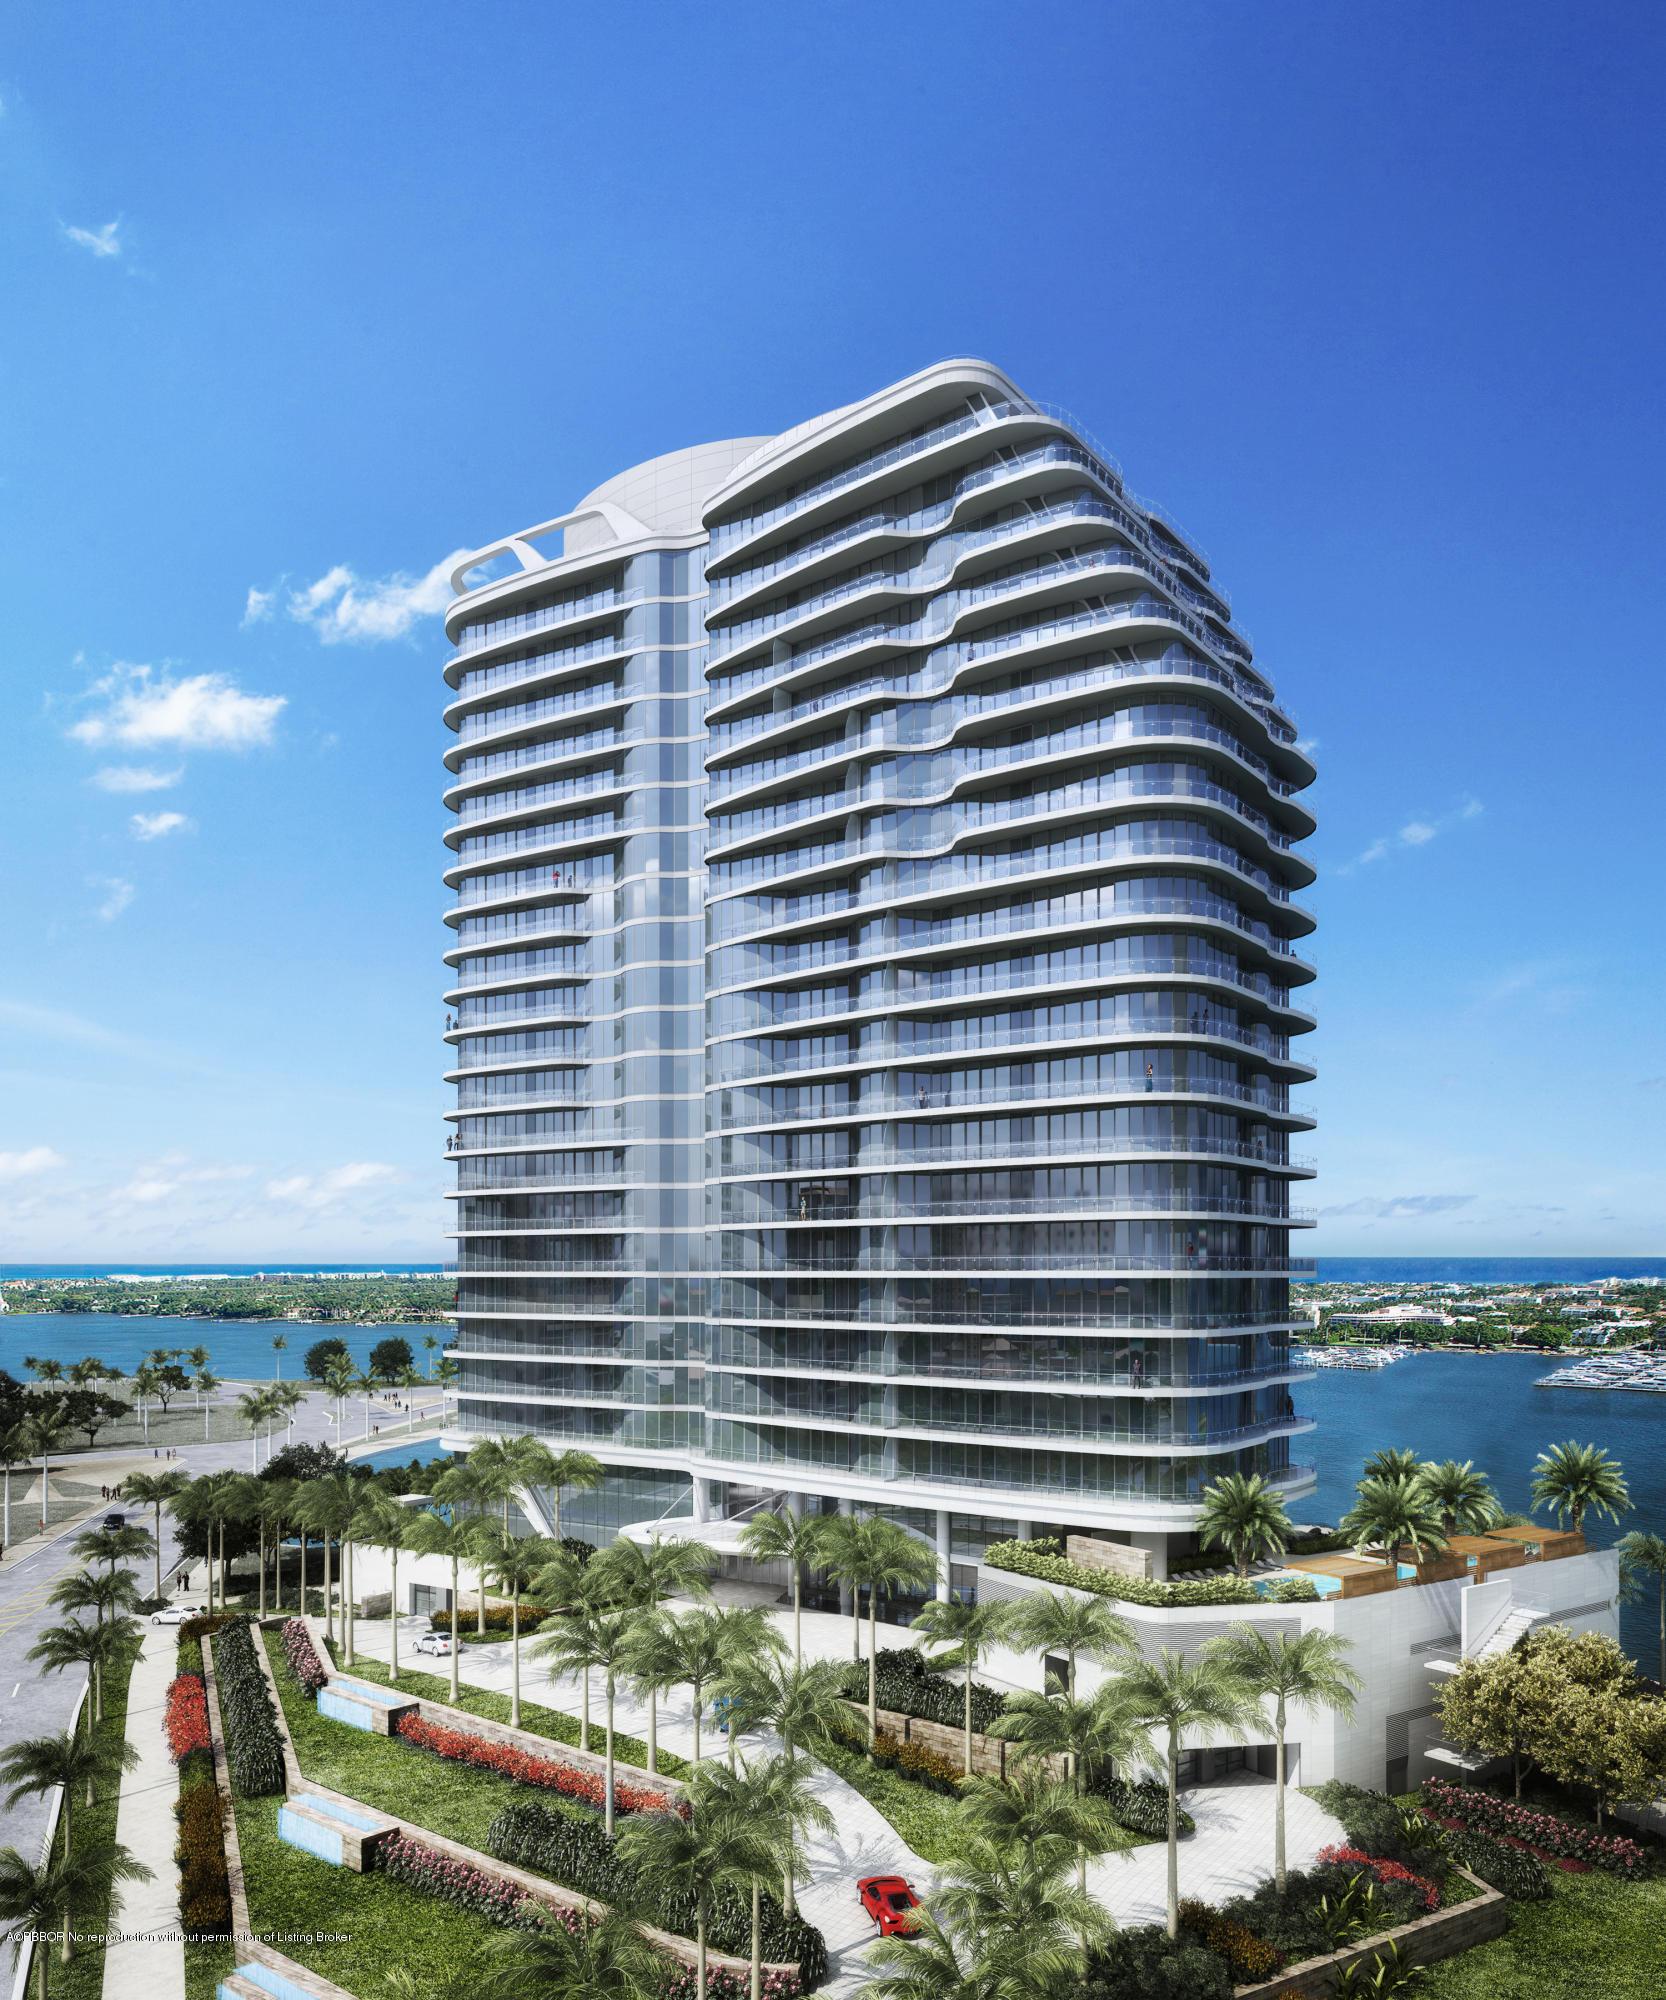 1100 S Flagler Drive, 602 - West Palm Beach, Florida